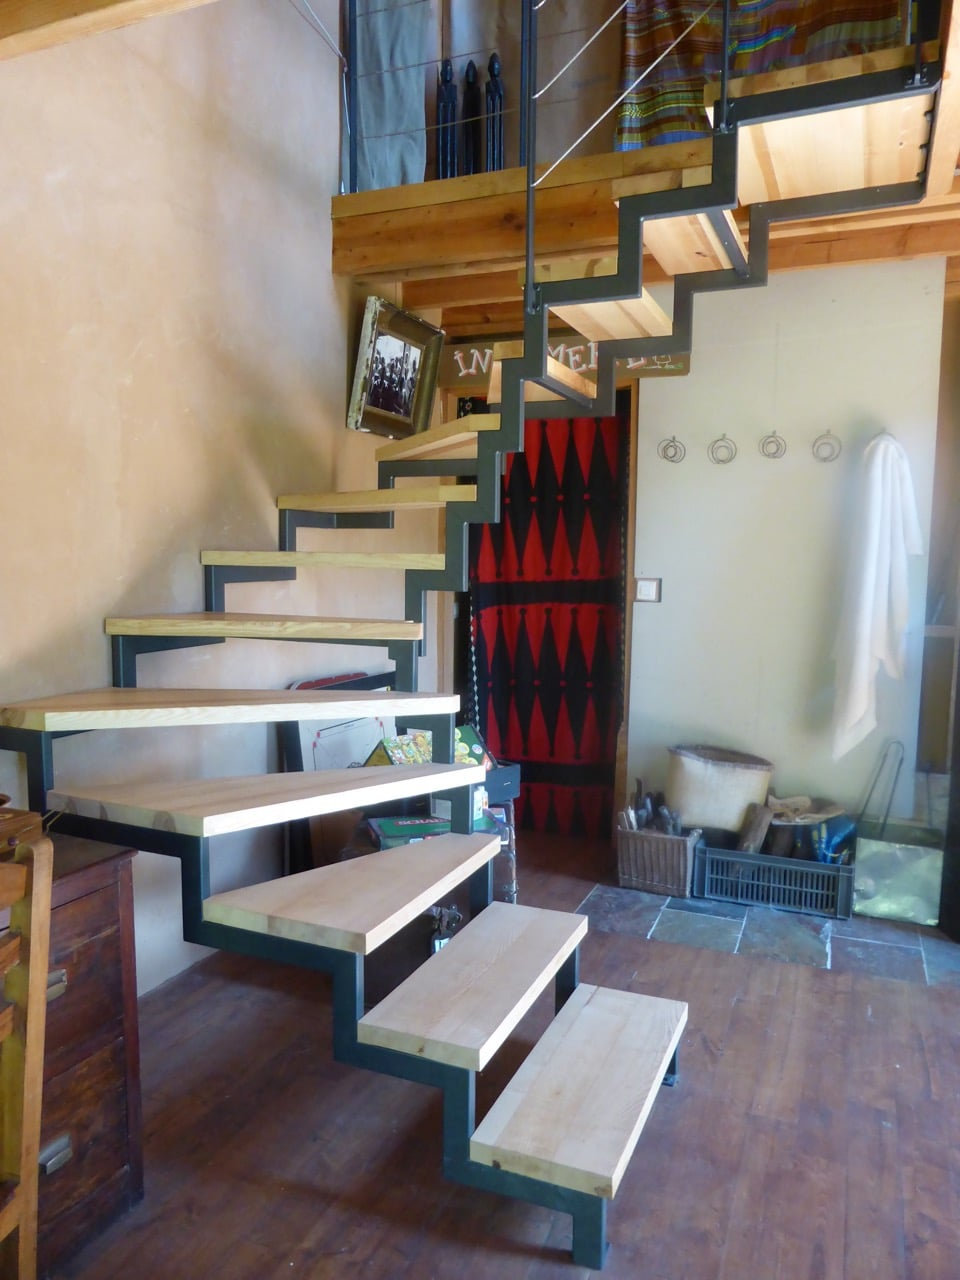 escalier colimacon2 escalier jacoby. Black Bedroom Furniture Sets. Home Design Ideas